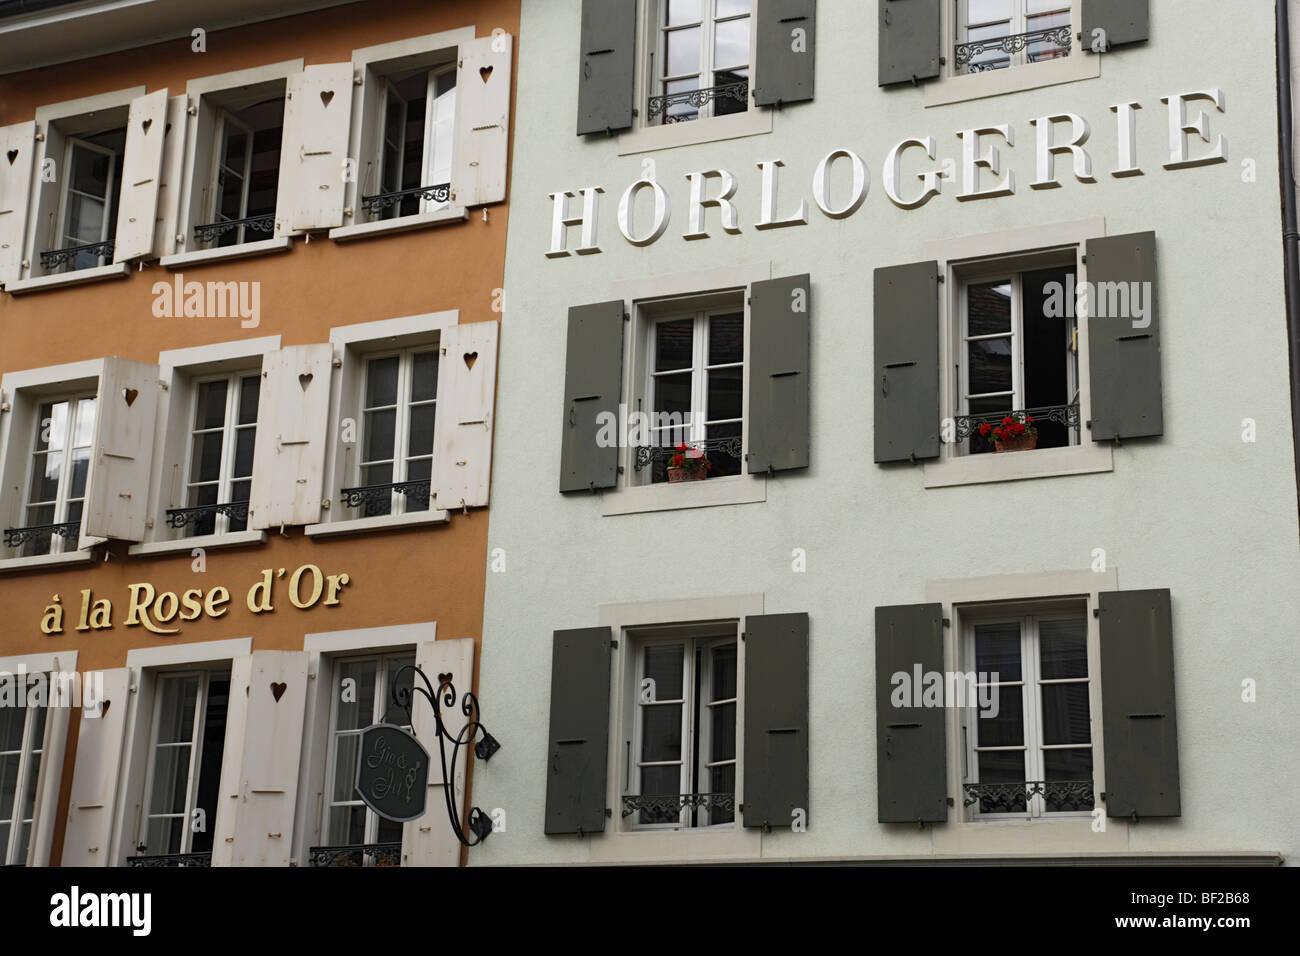 Watchmaker at Rue du Lac, Vevey, Canton of Vaud, Switzerland - Stock Image